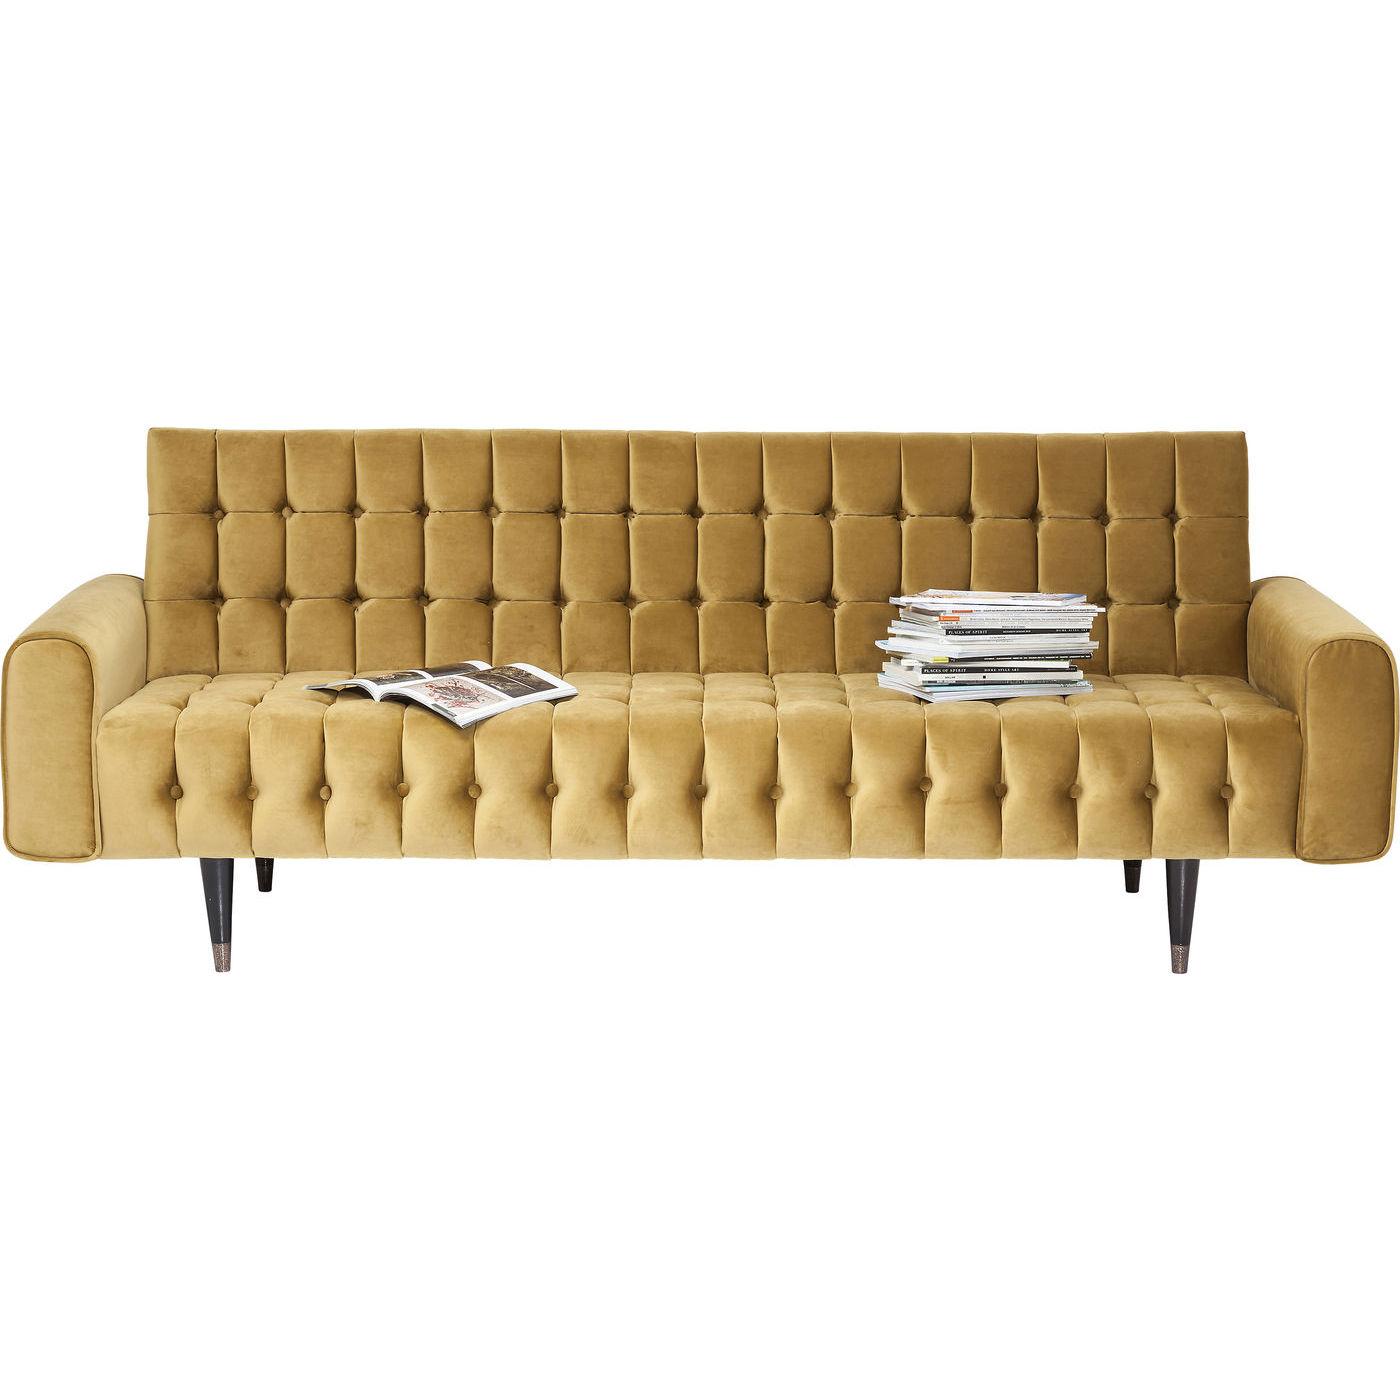 KARE DESIGN Milchbar Honey 3 pers. Sofa